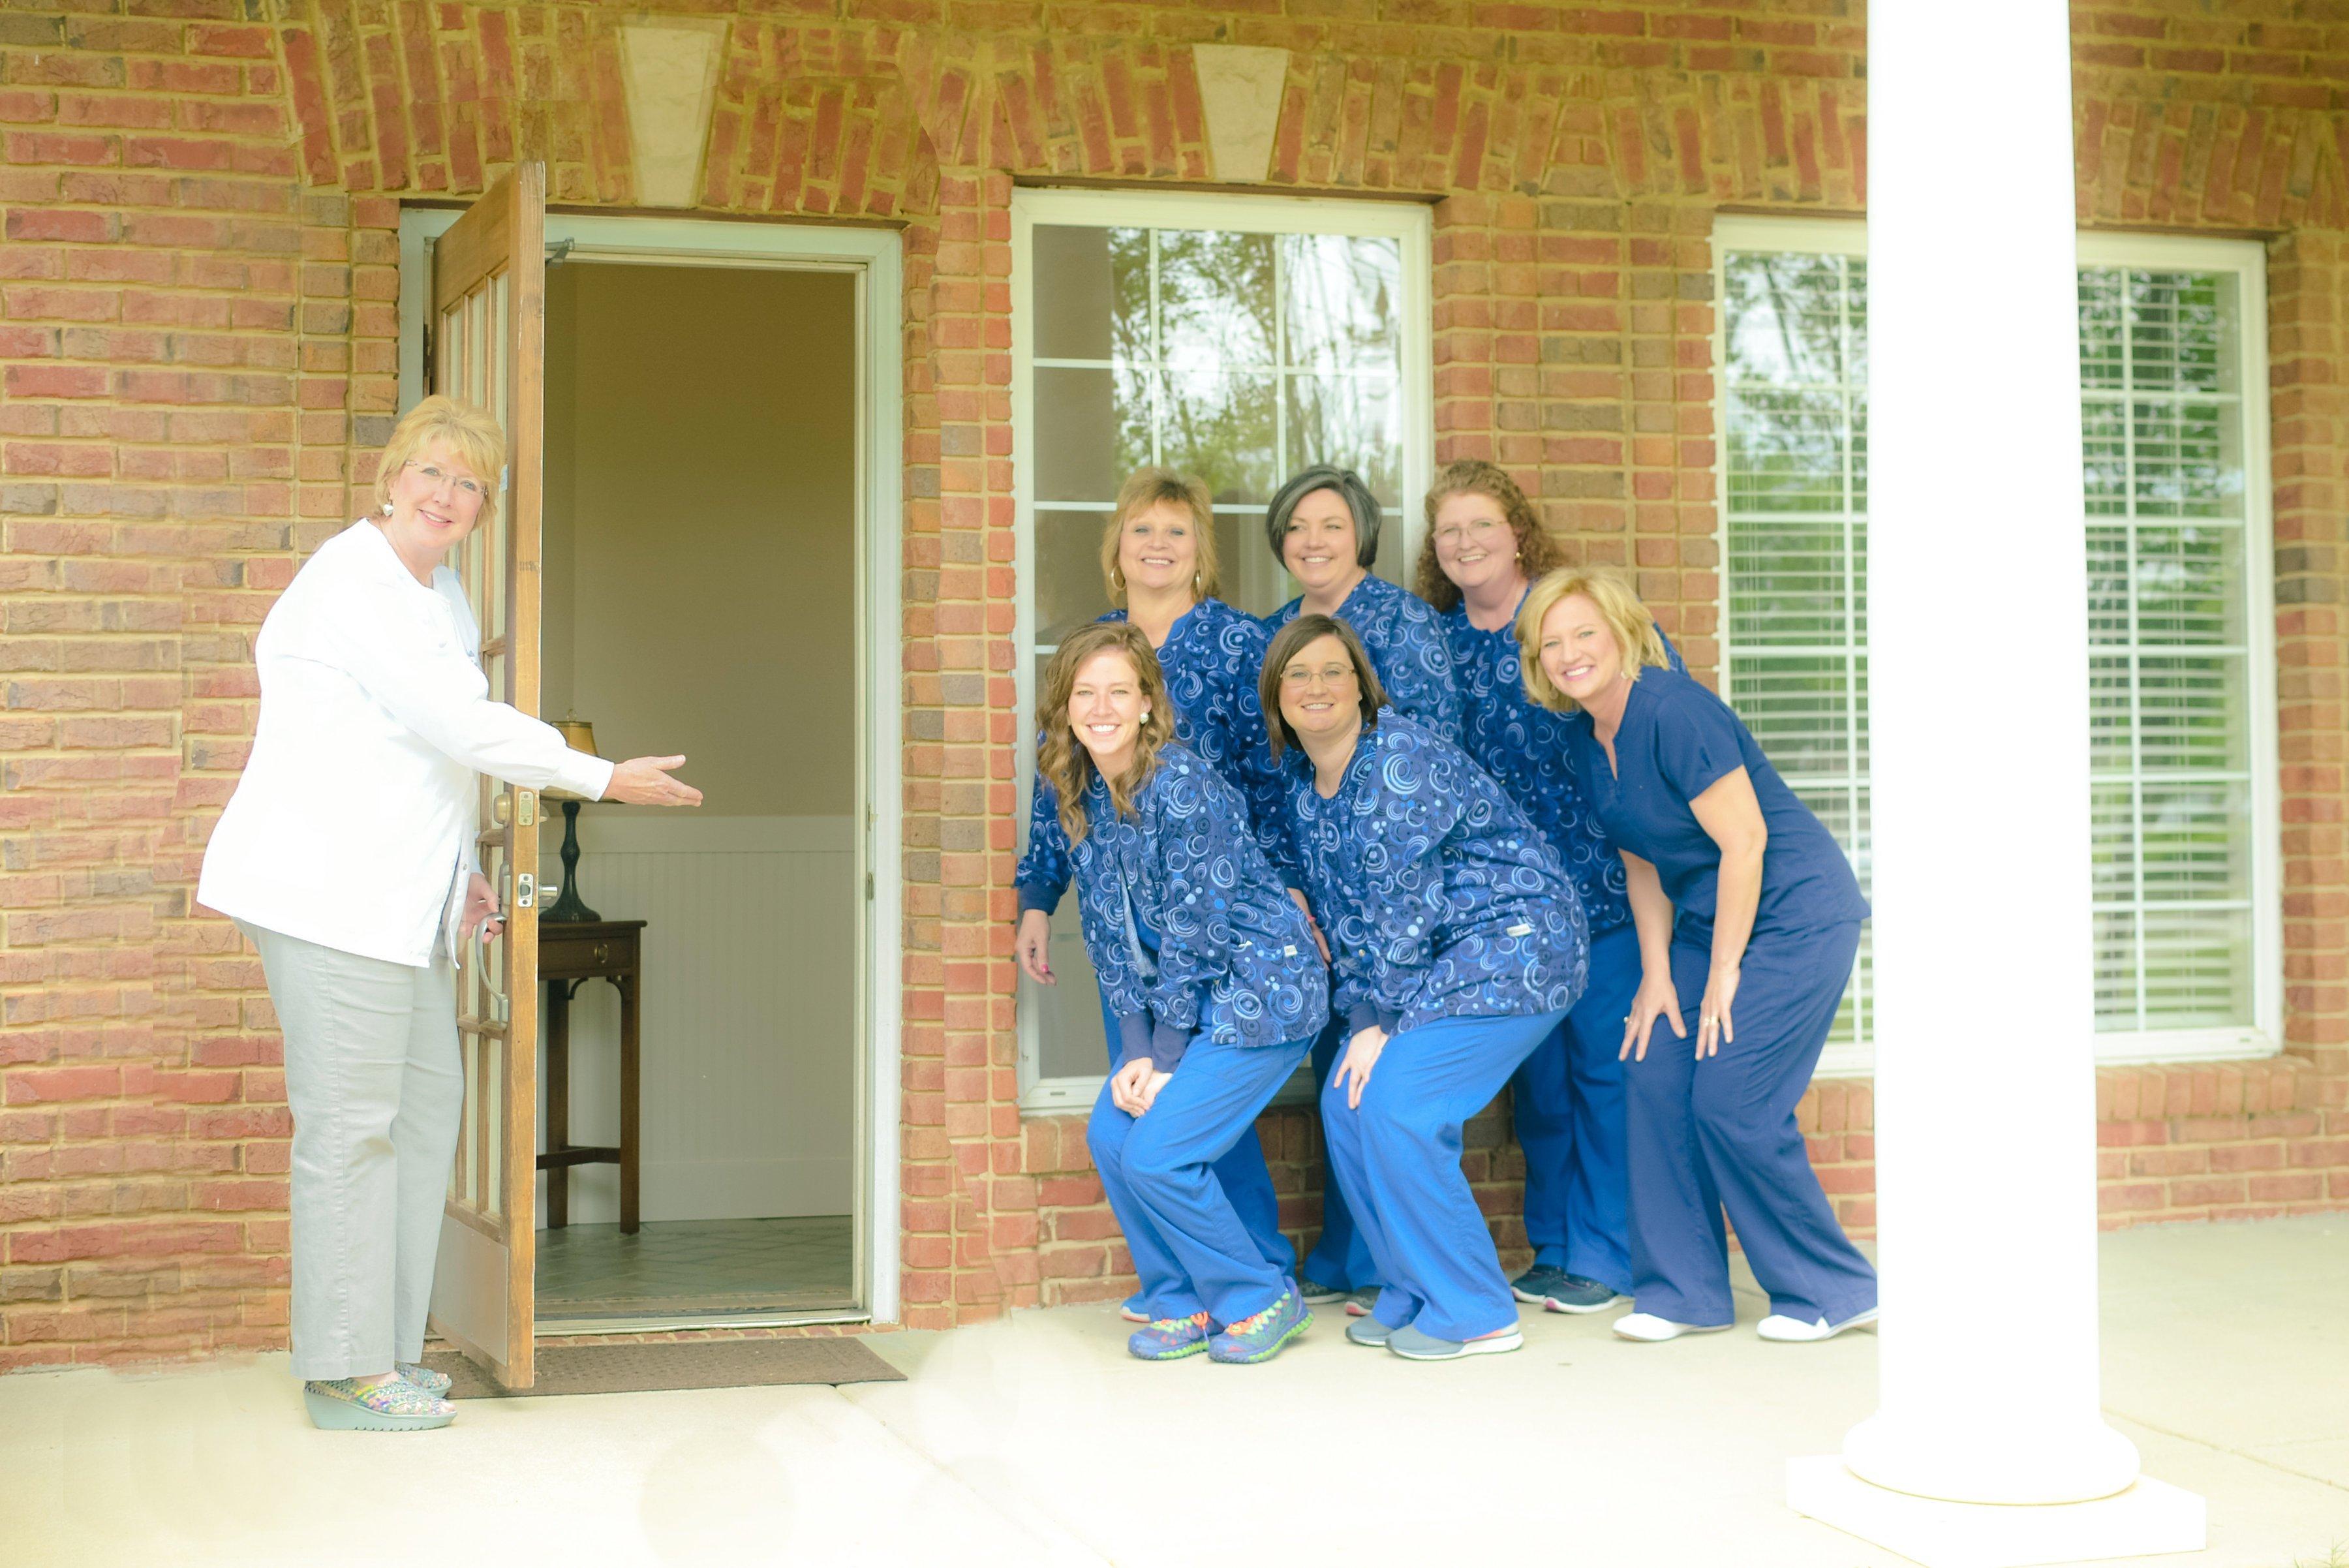 dental staff members smiling for camera